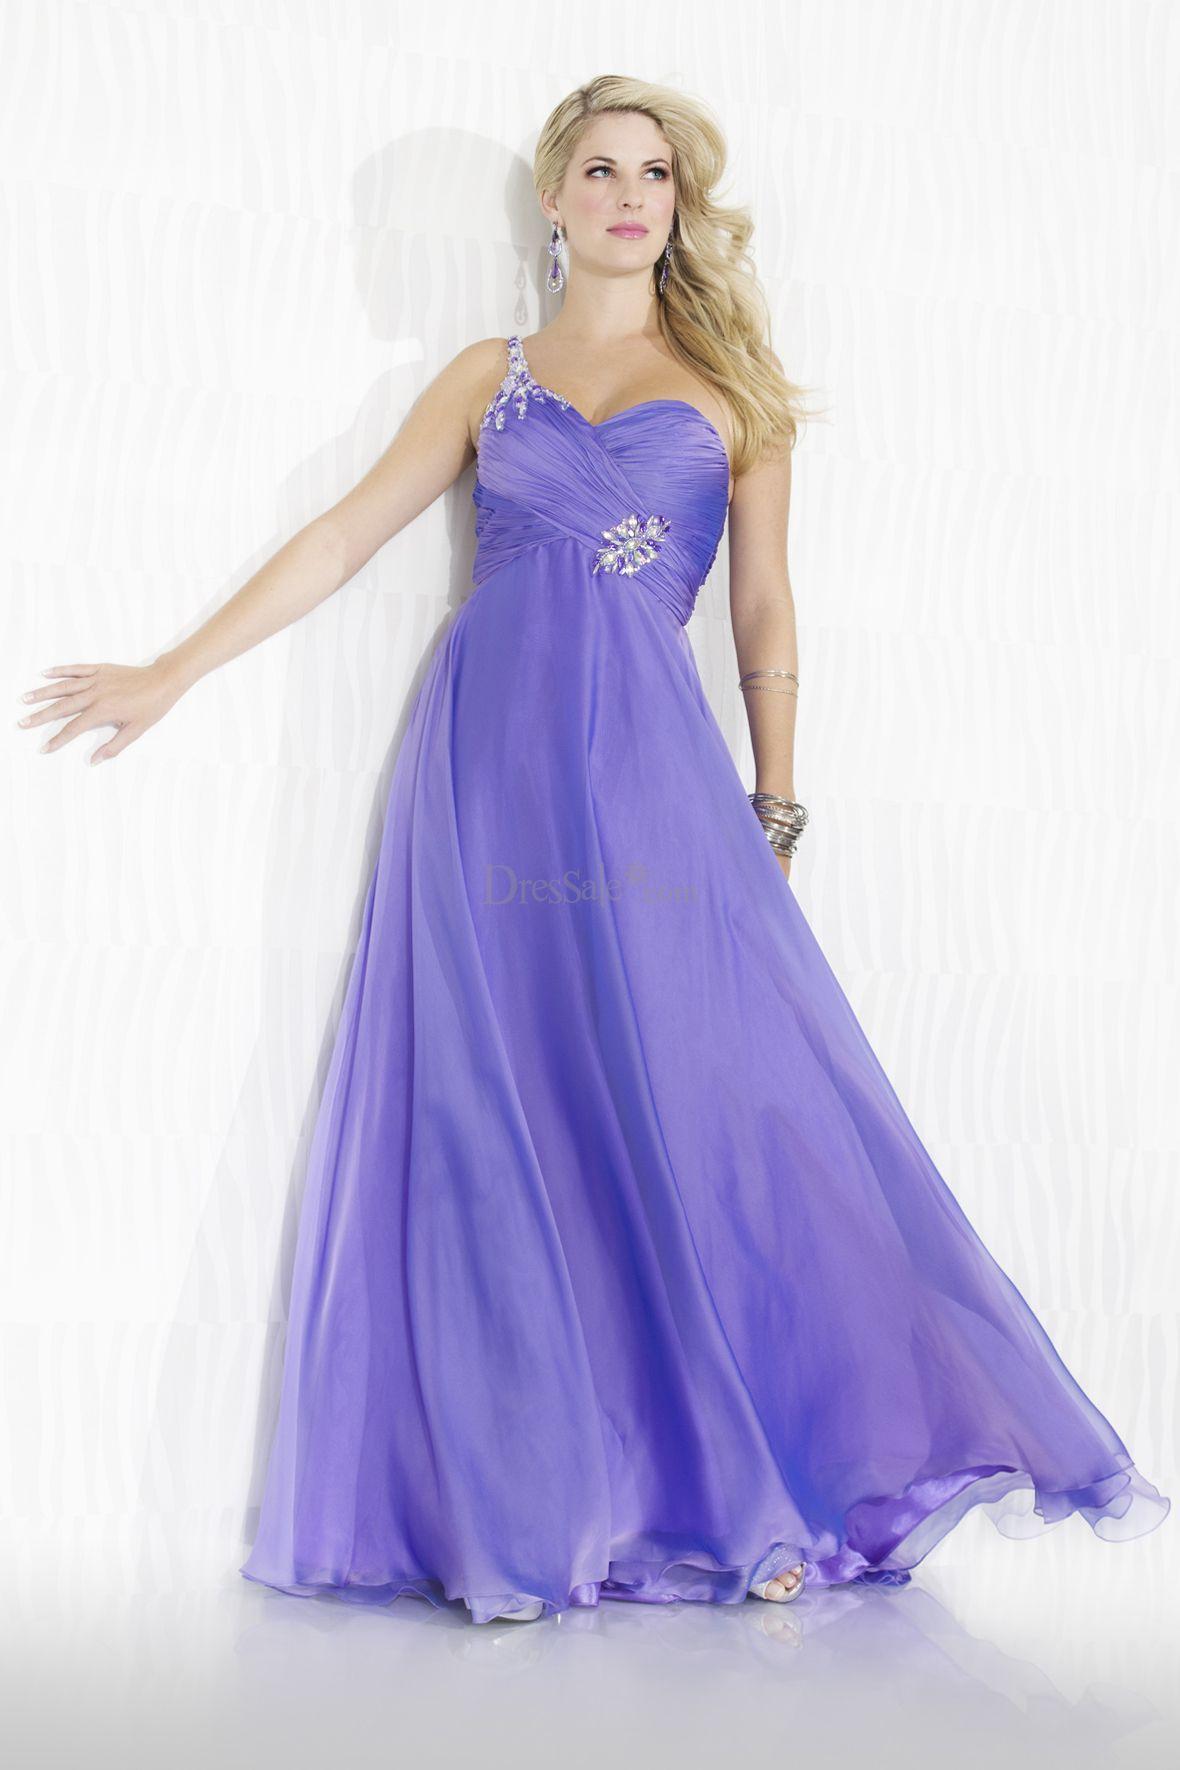 Impressive Sweetheart Prom Dress with One Shoulder Design